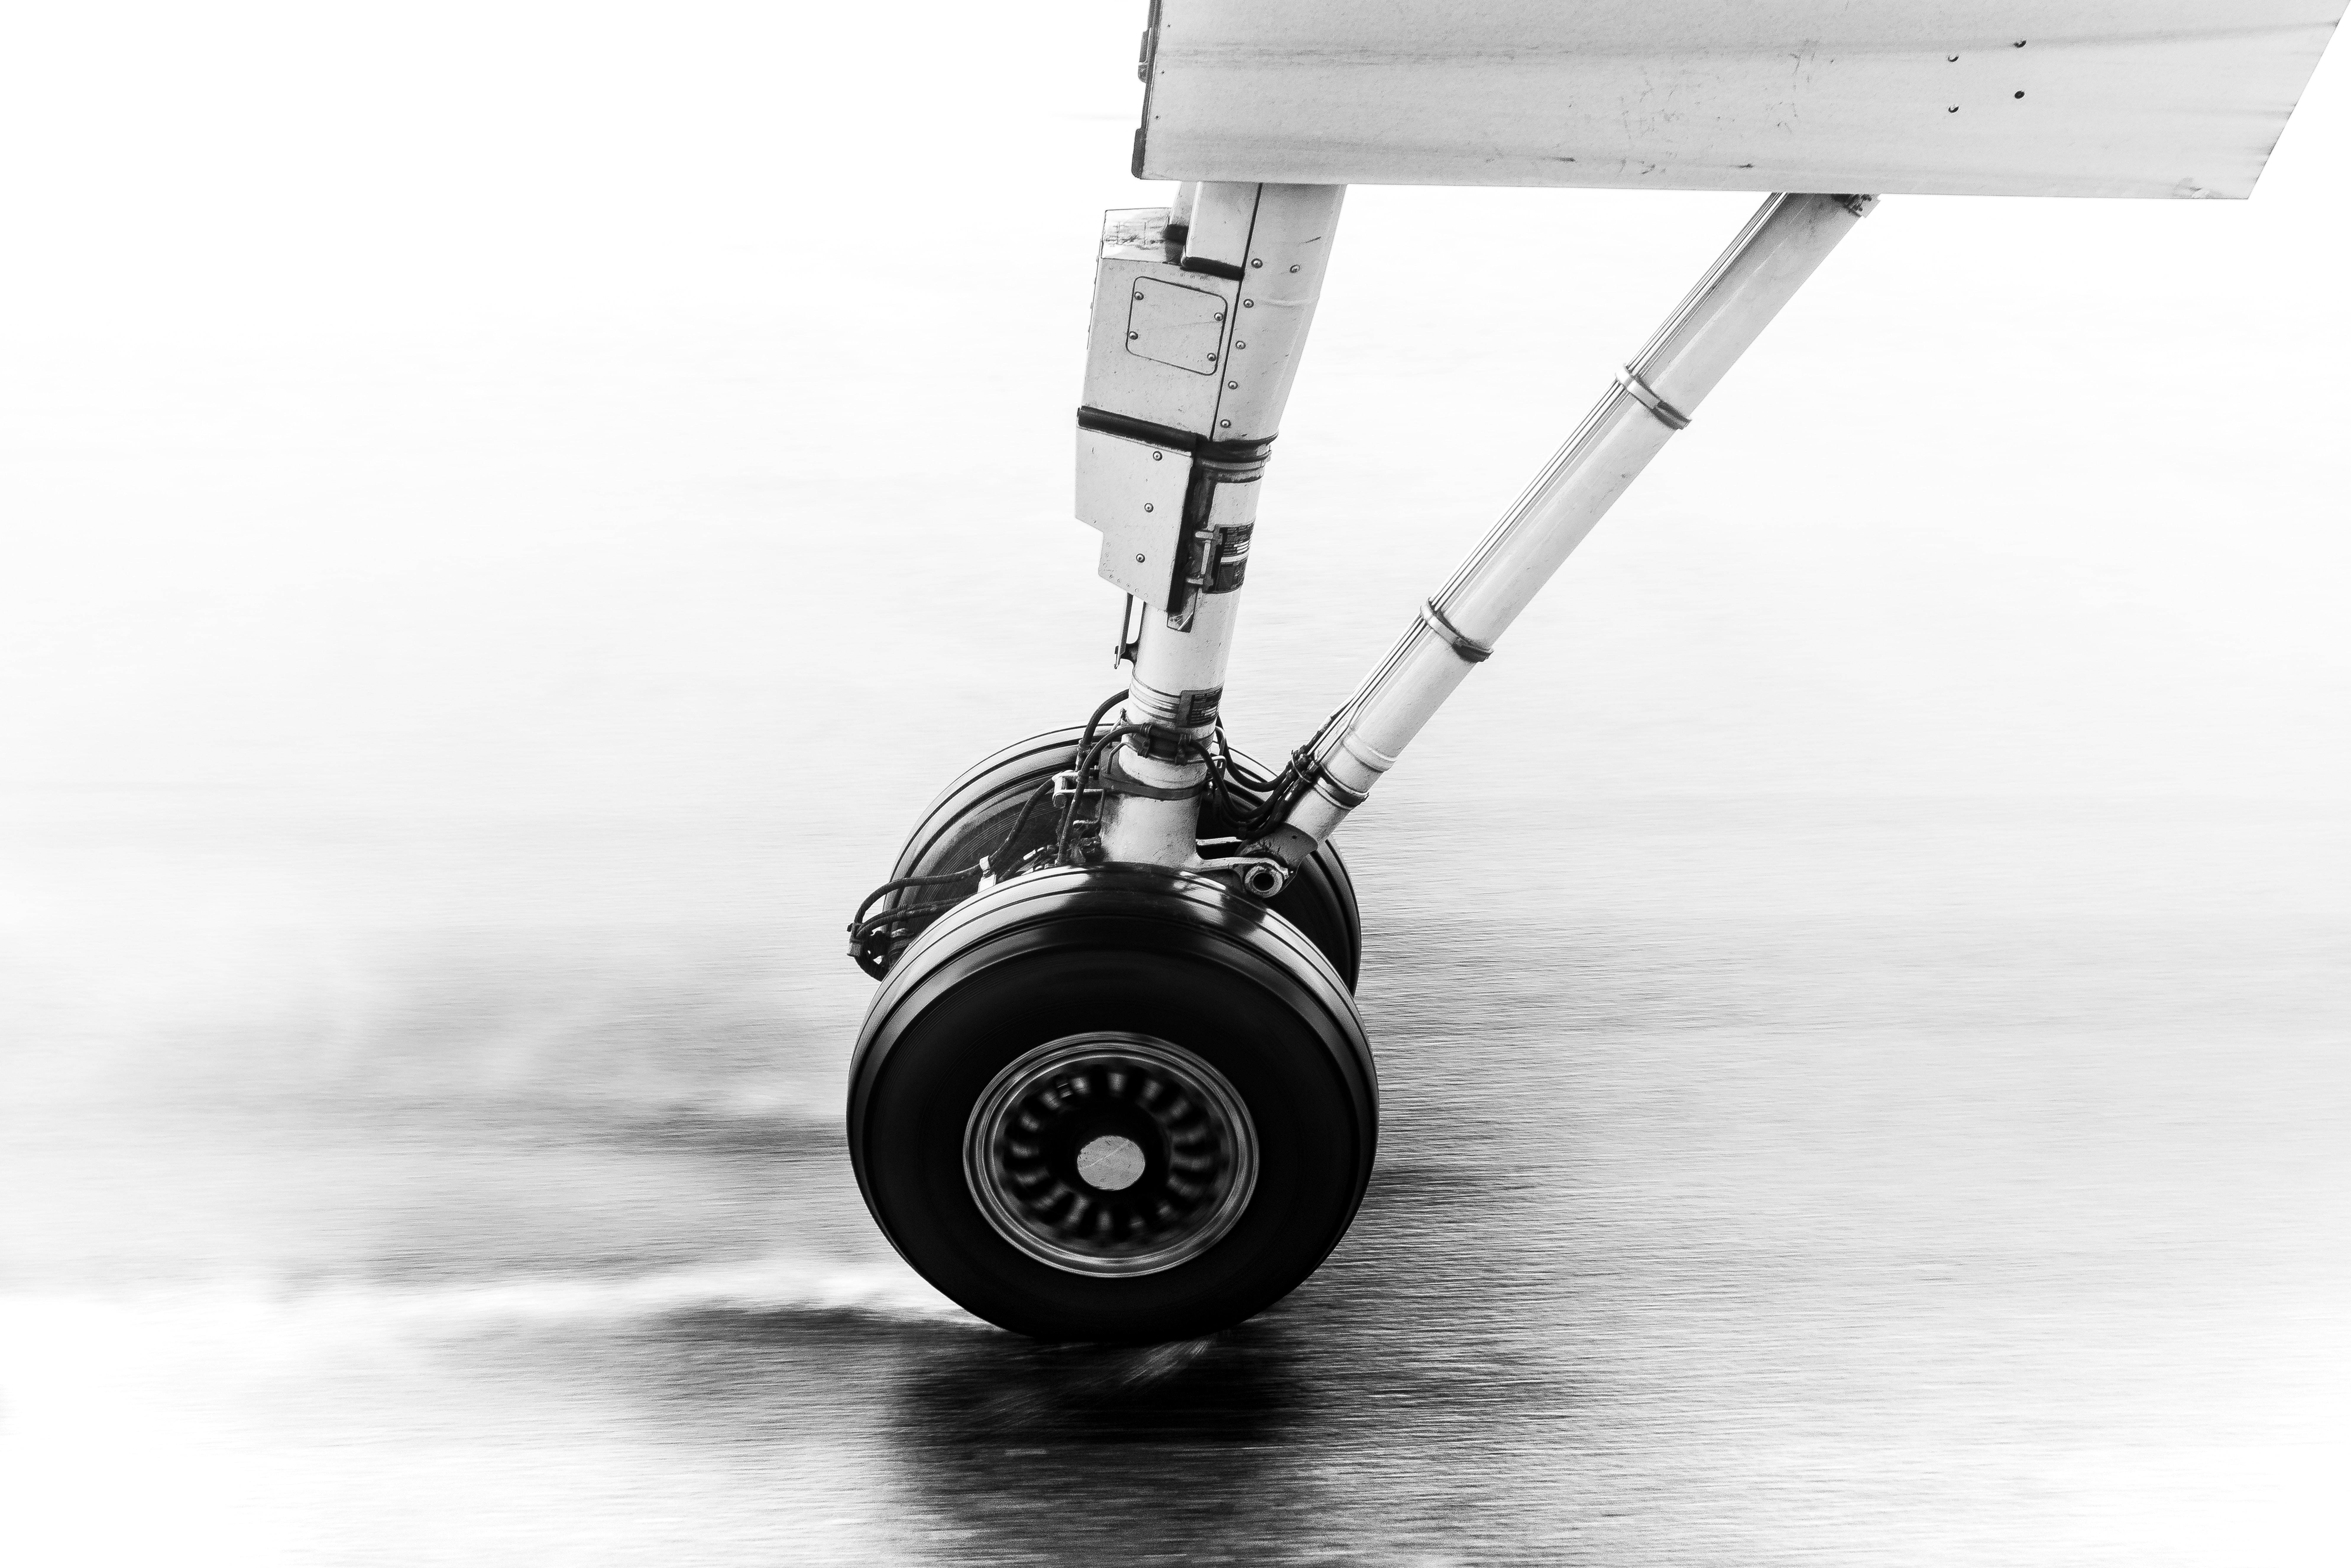 black airplane wheel